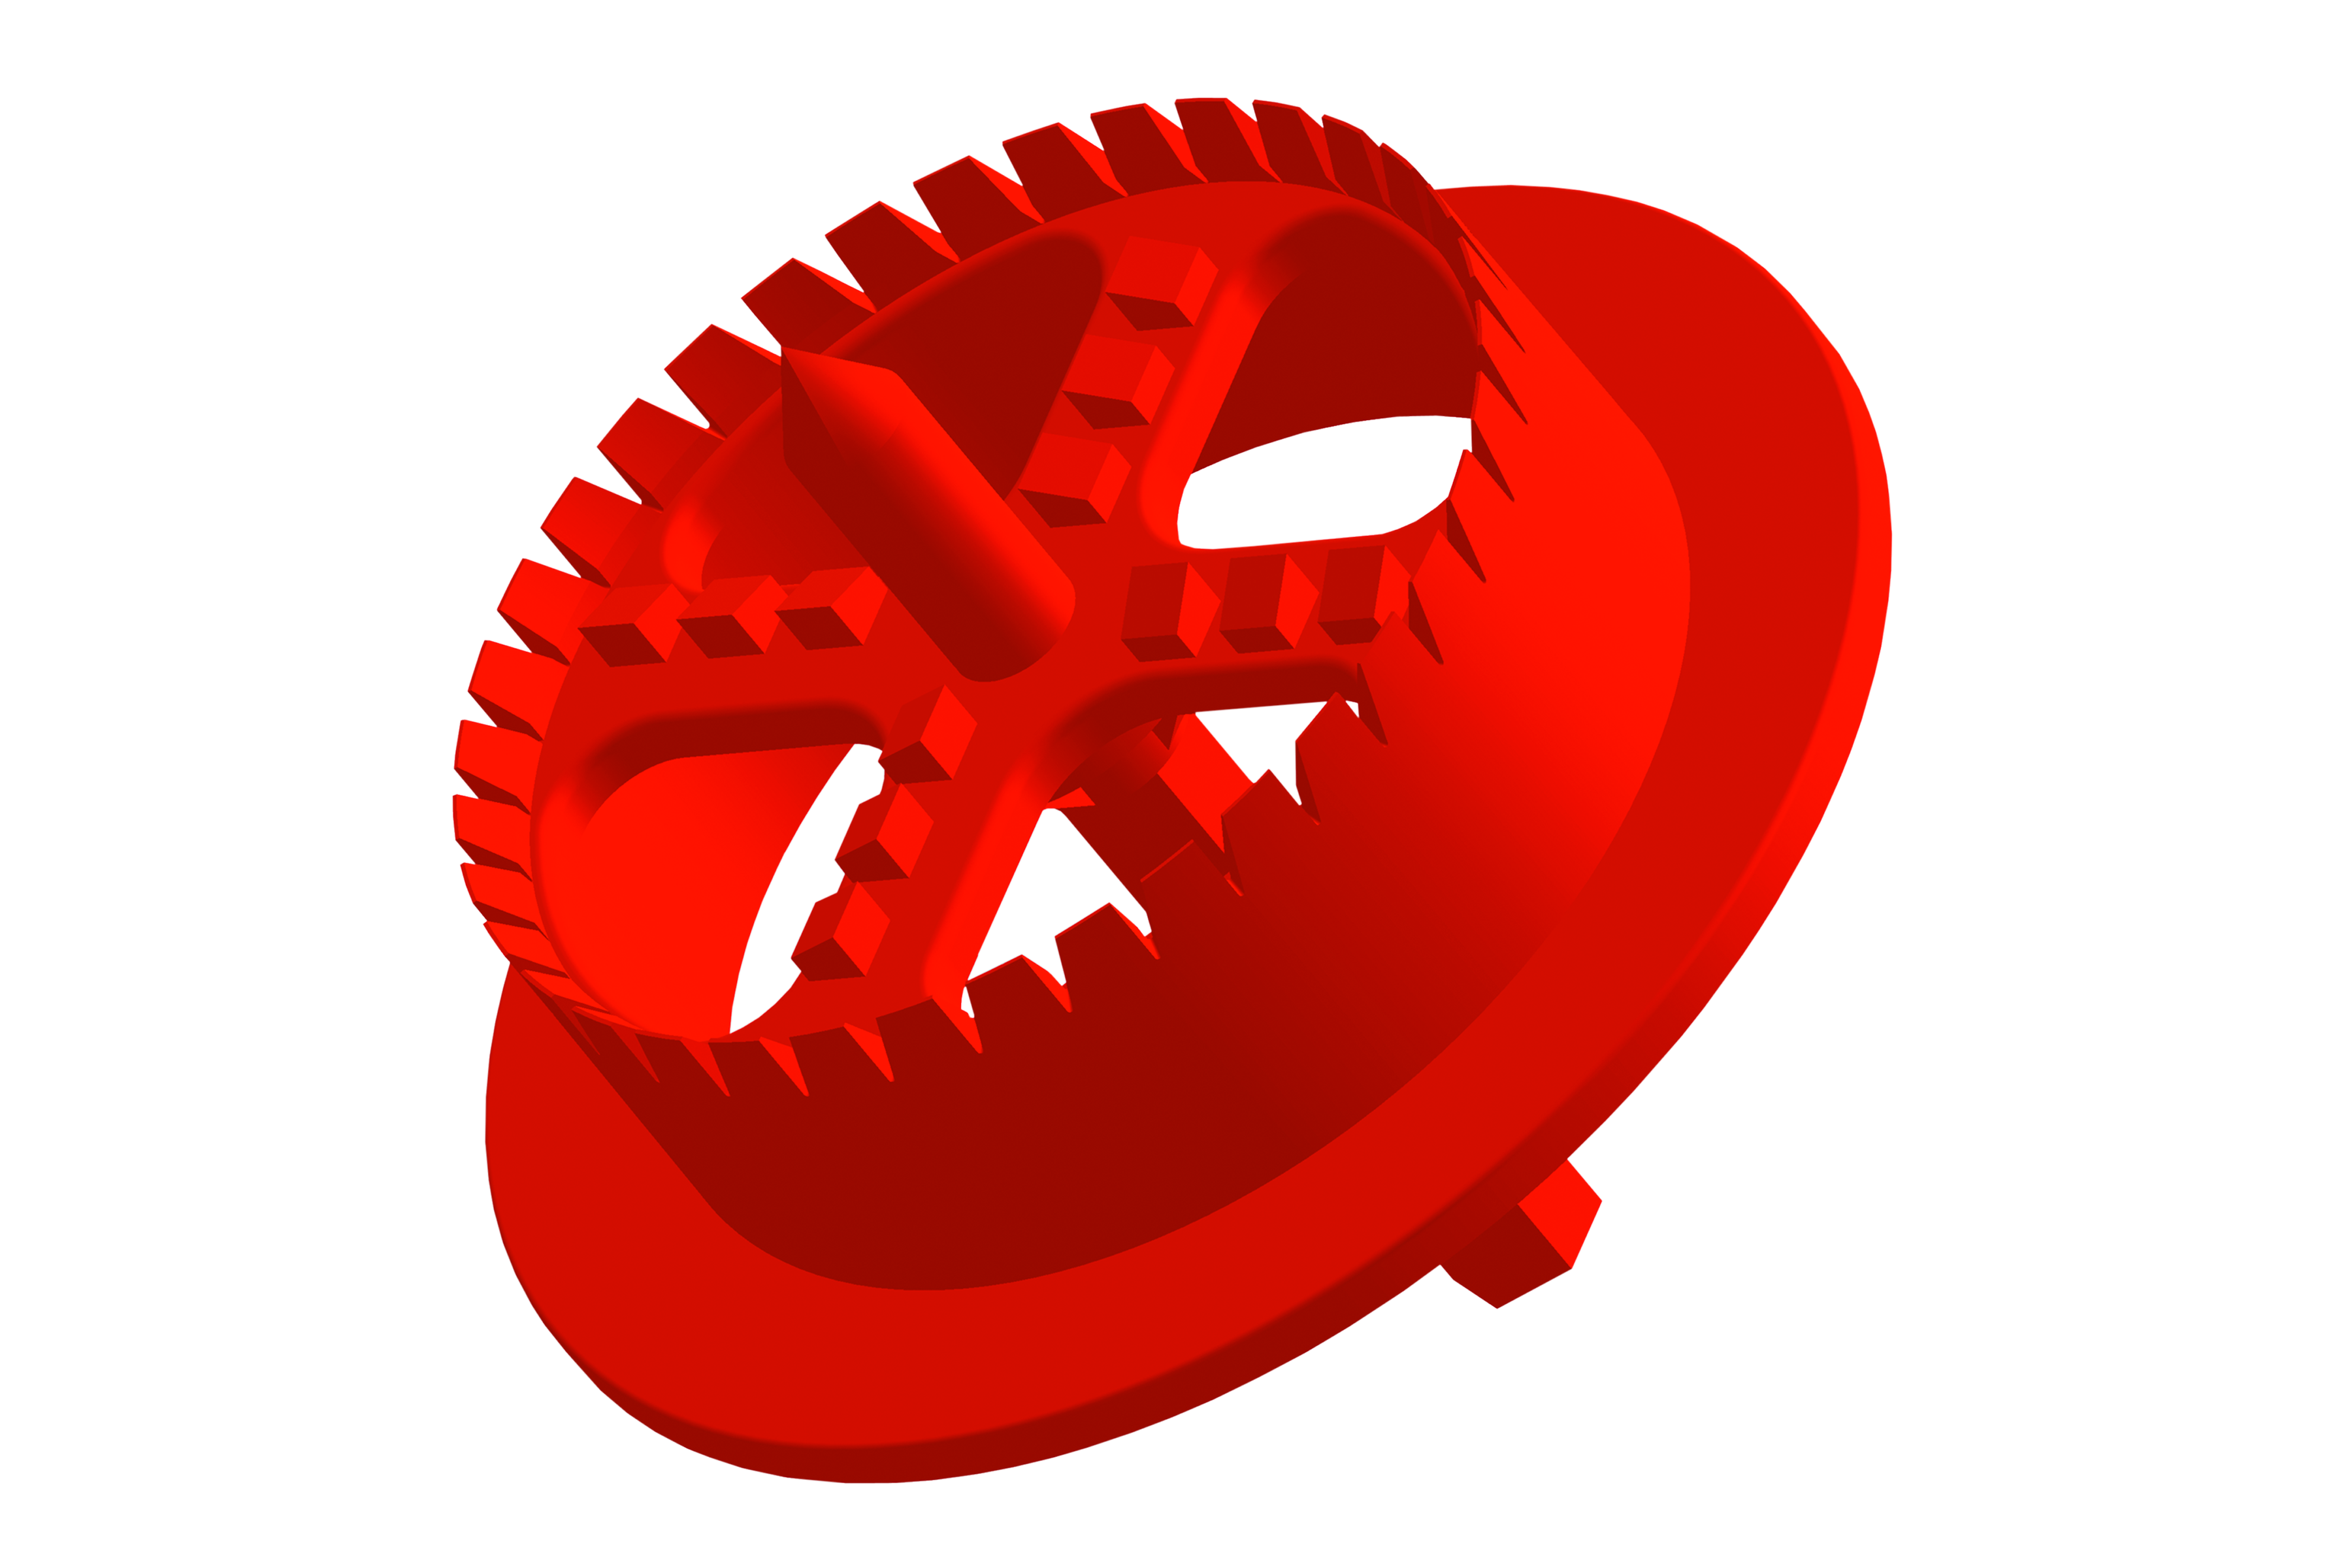 WK-FT Polystyrene Disk